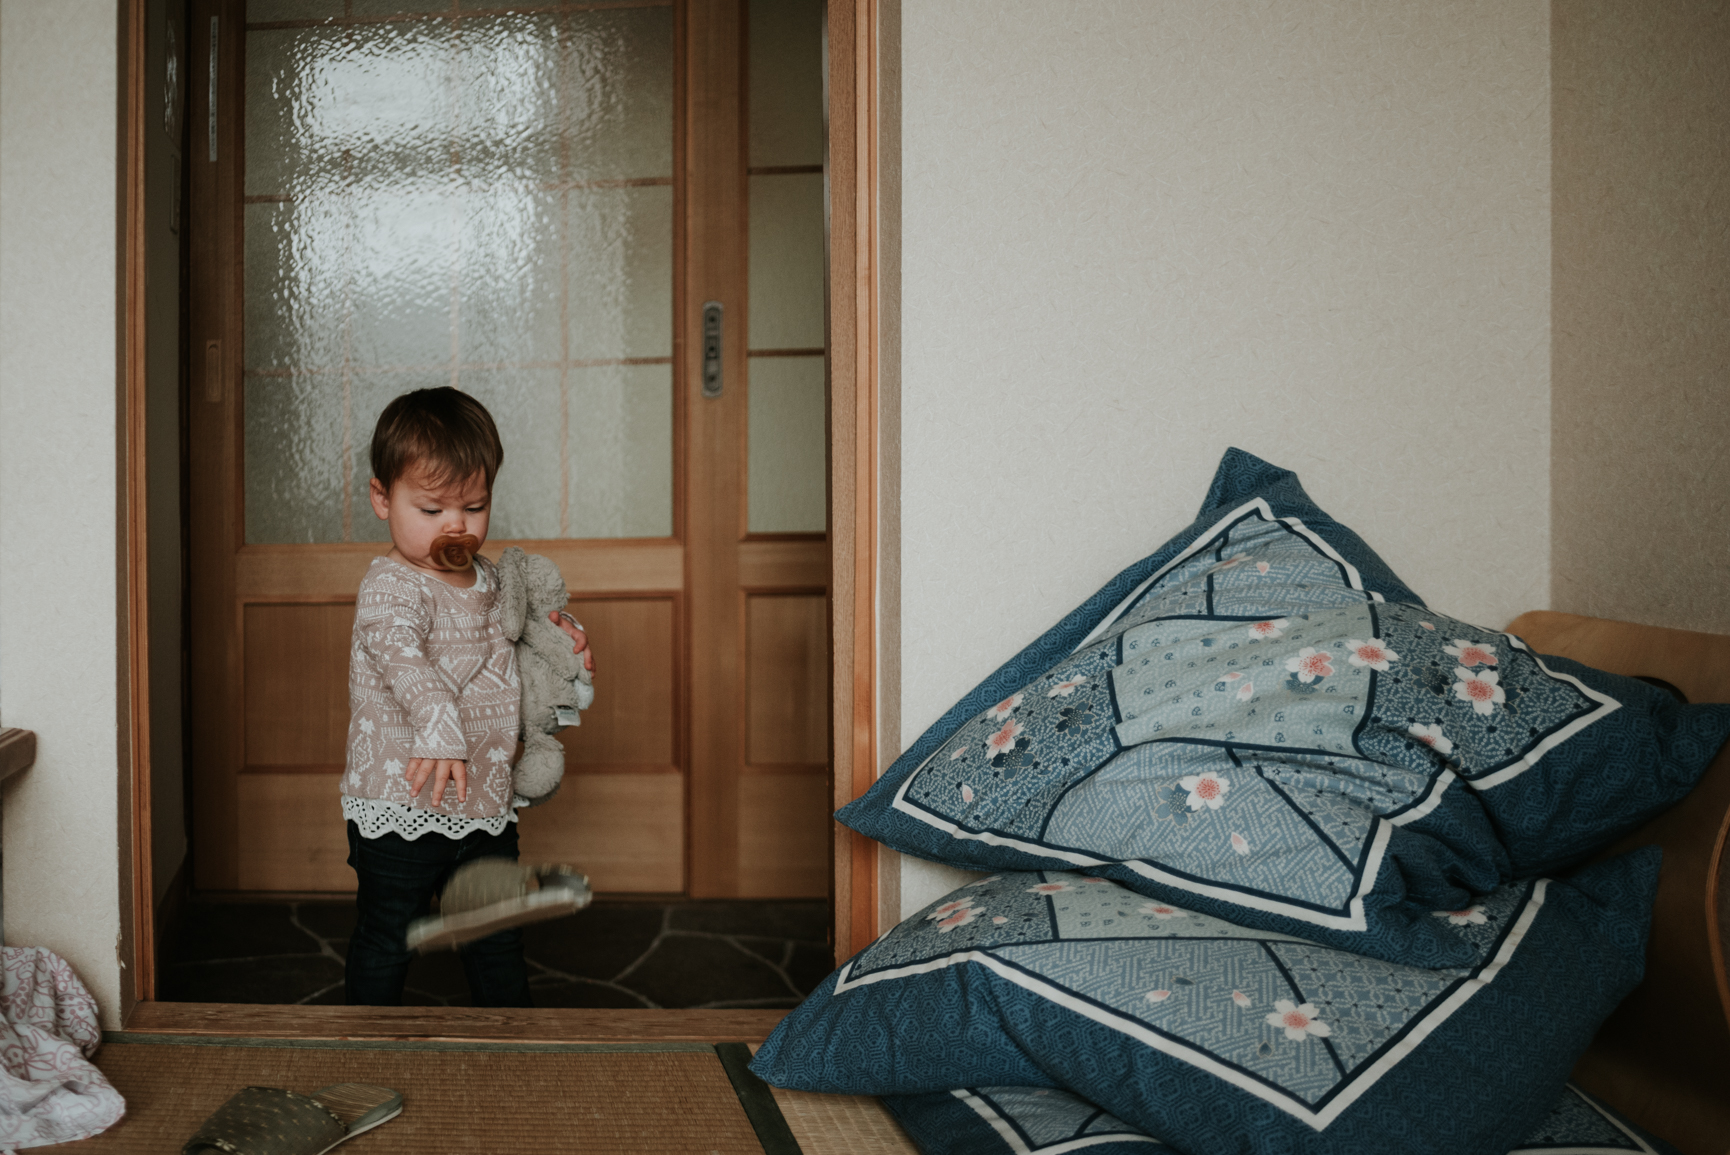 161119-090839-NihonisJapan-a2-8543.jpg